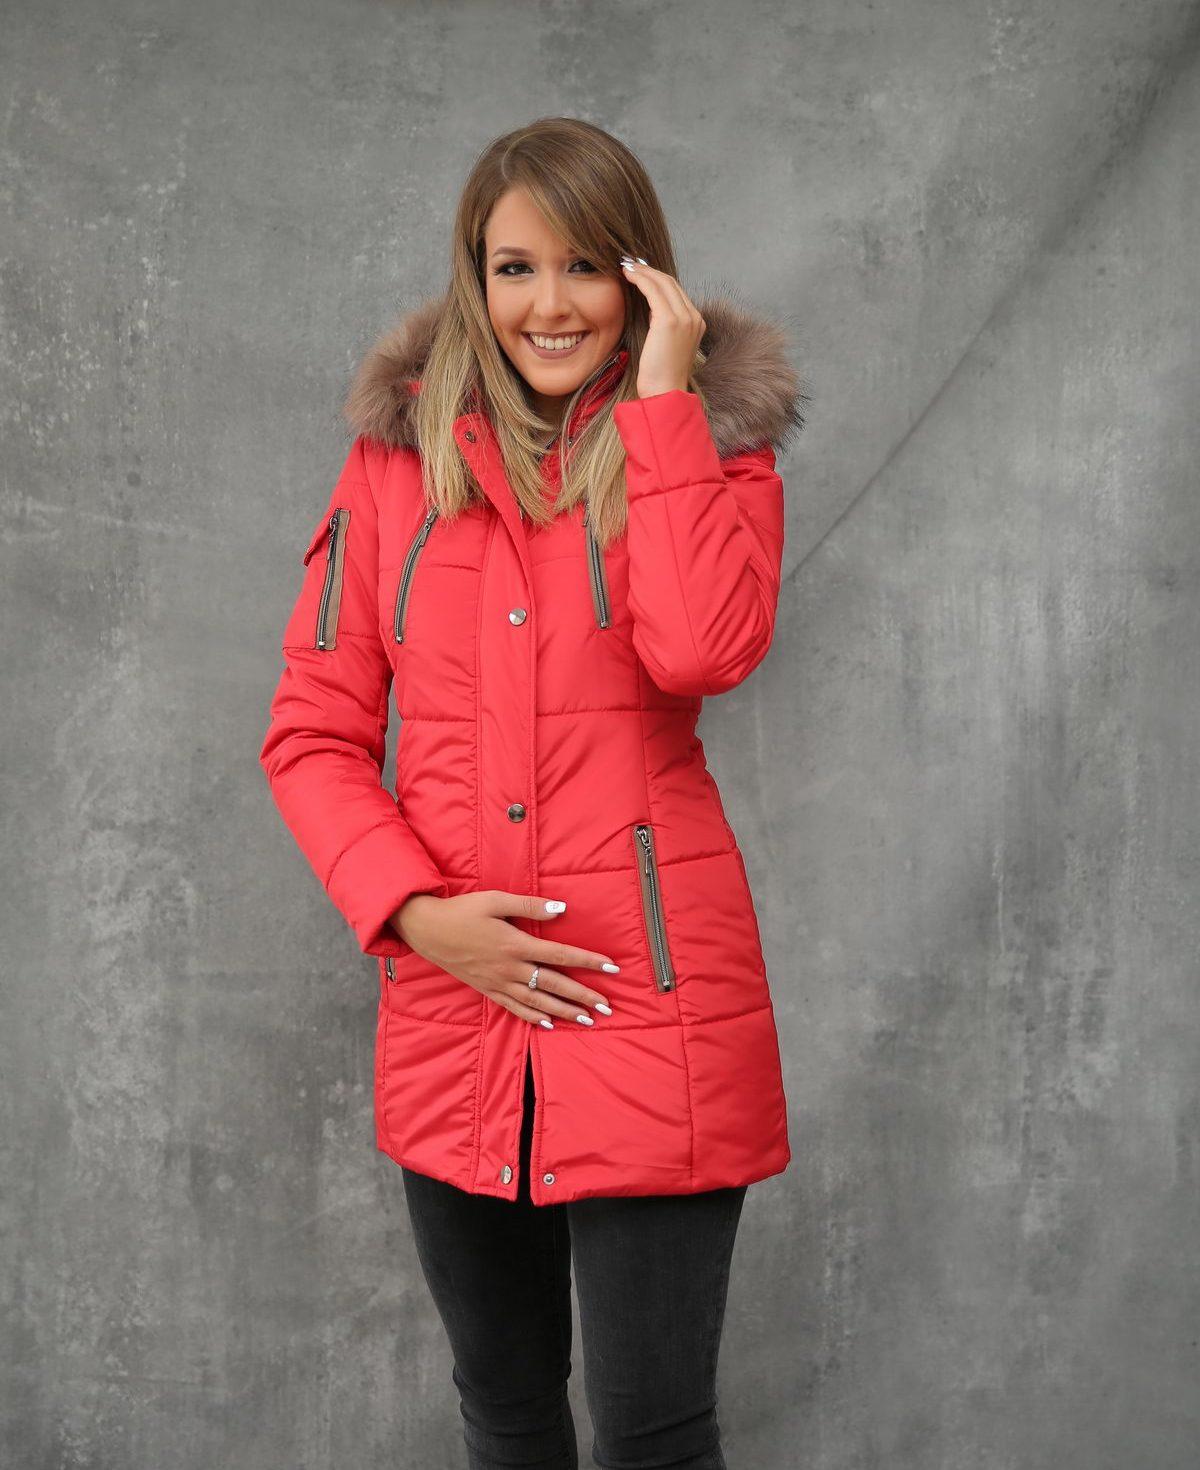 Ženska jakna ForteFashion model E4 (crvena)